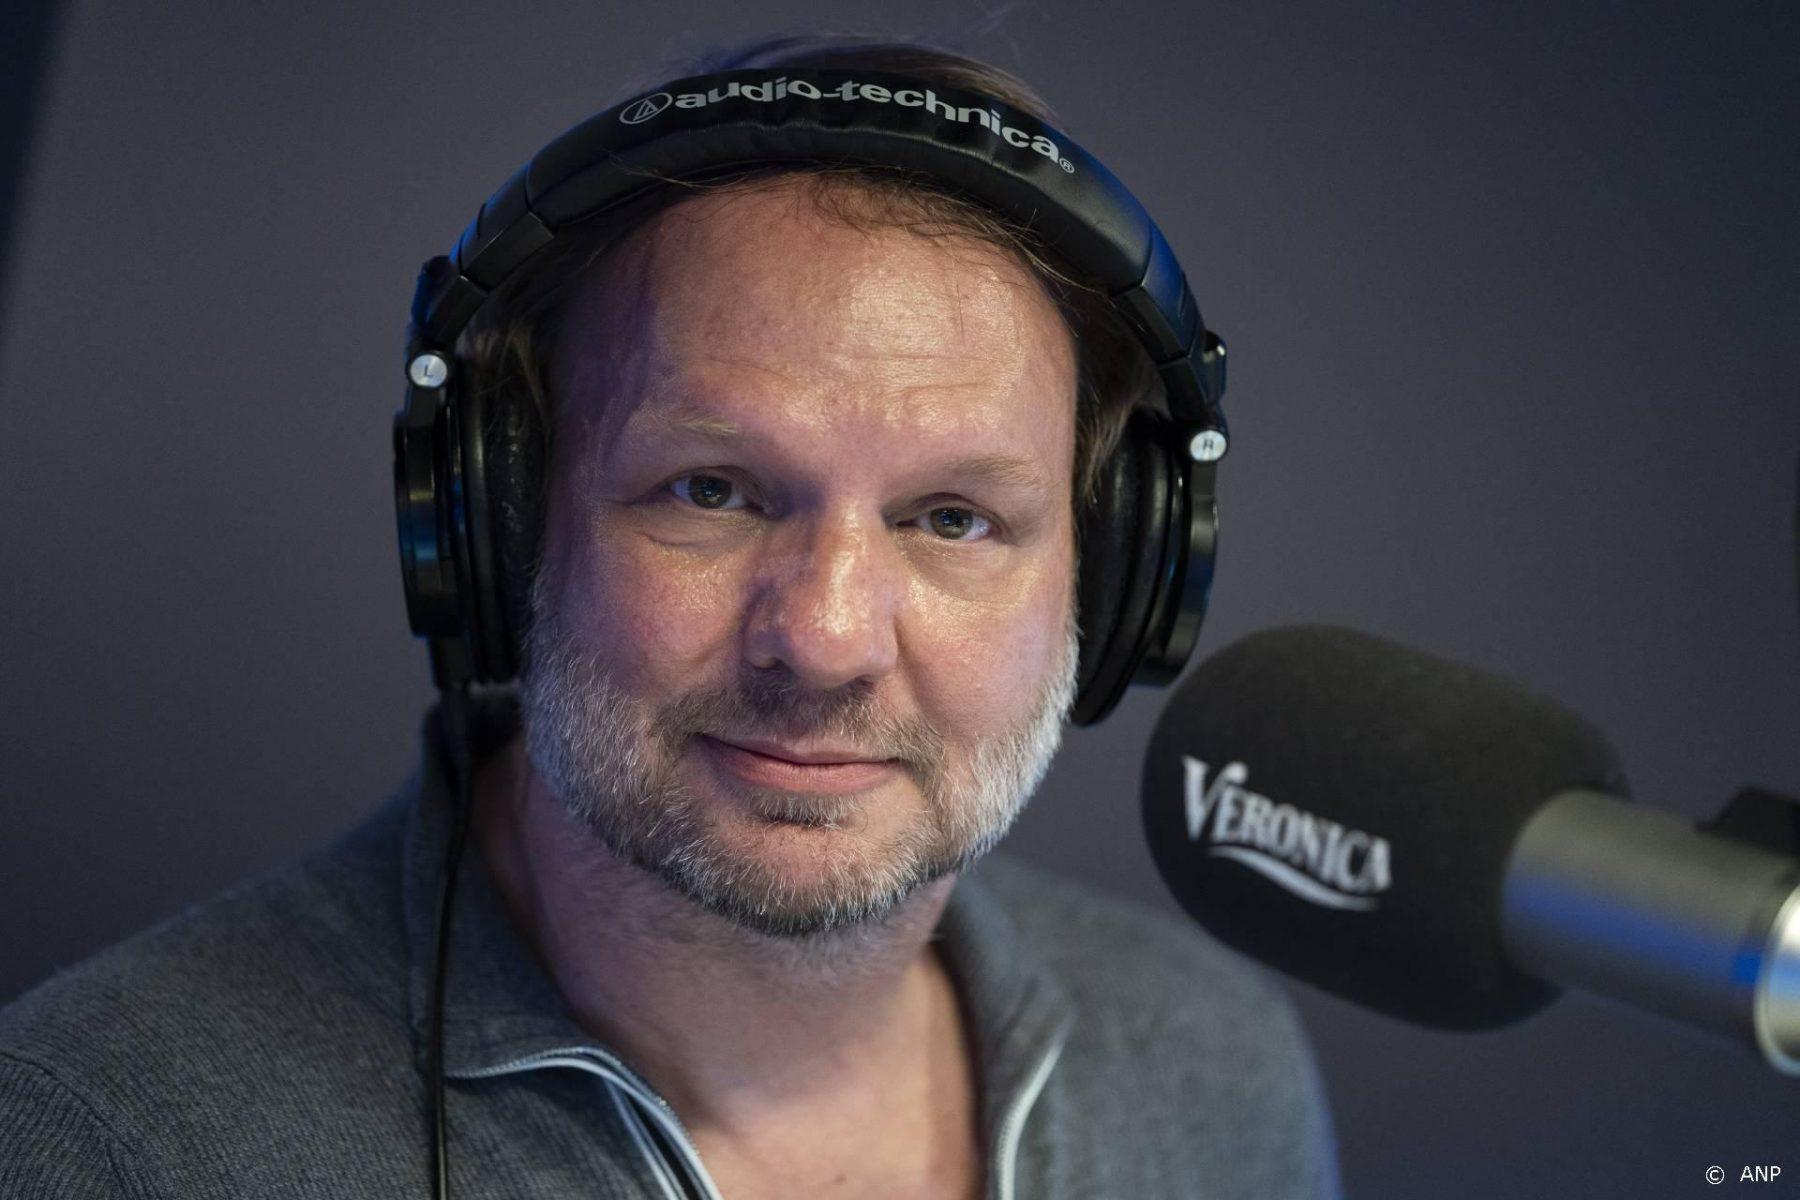 Rob Stenders terug op de radio na coronabesmetting: 'Ik blaf nog een beetje'